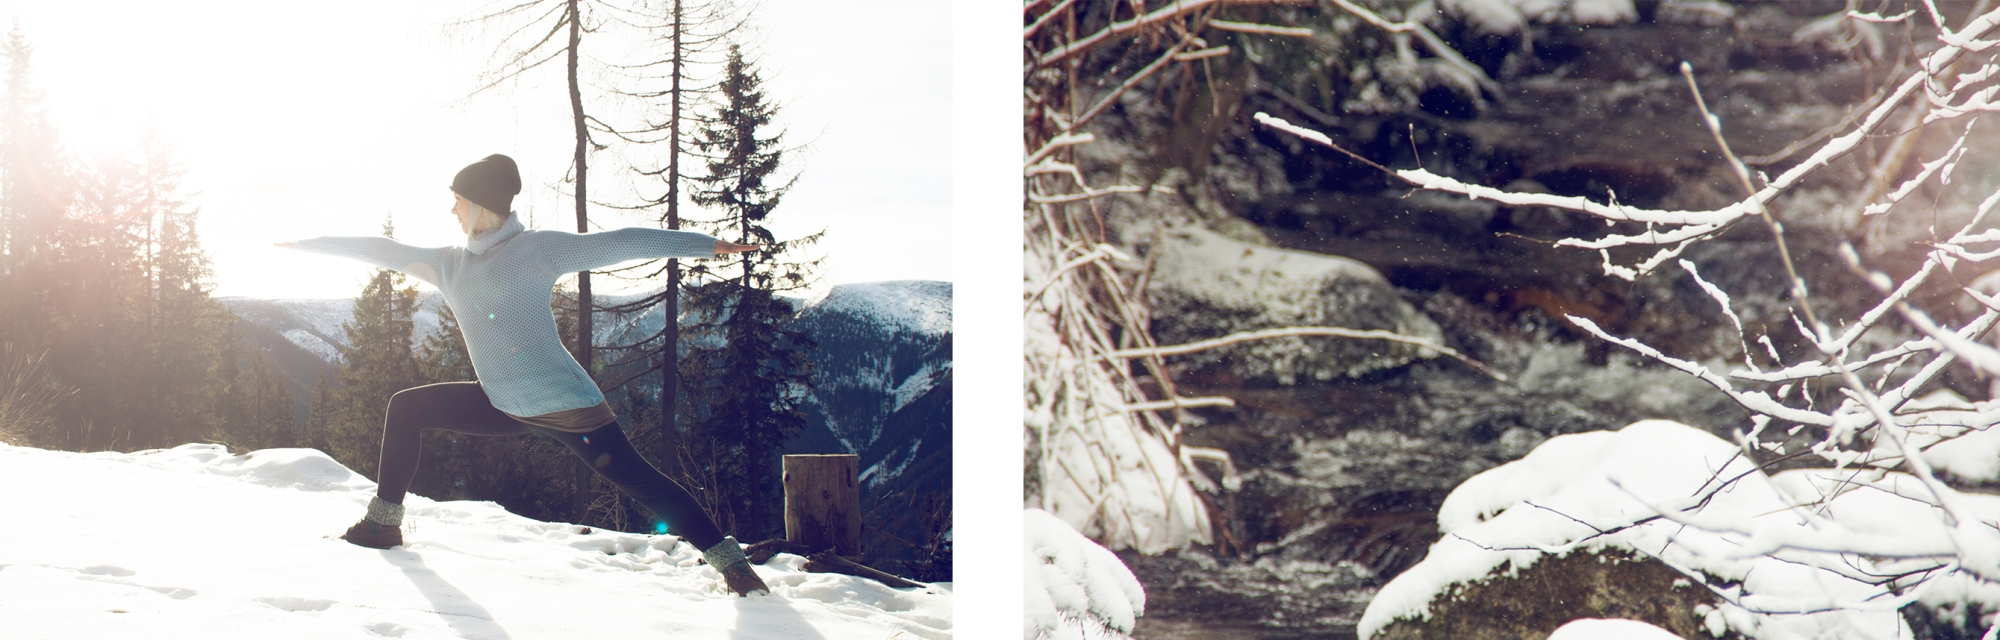 Having fun in winter wonderland  by JuYogi